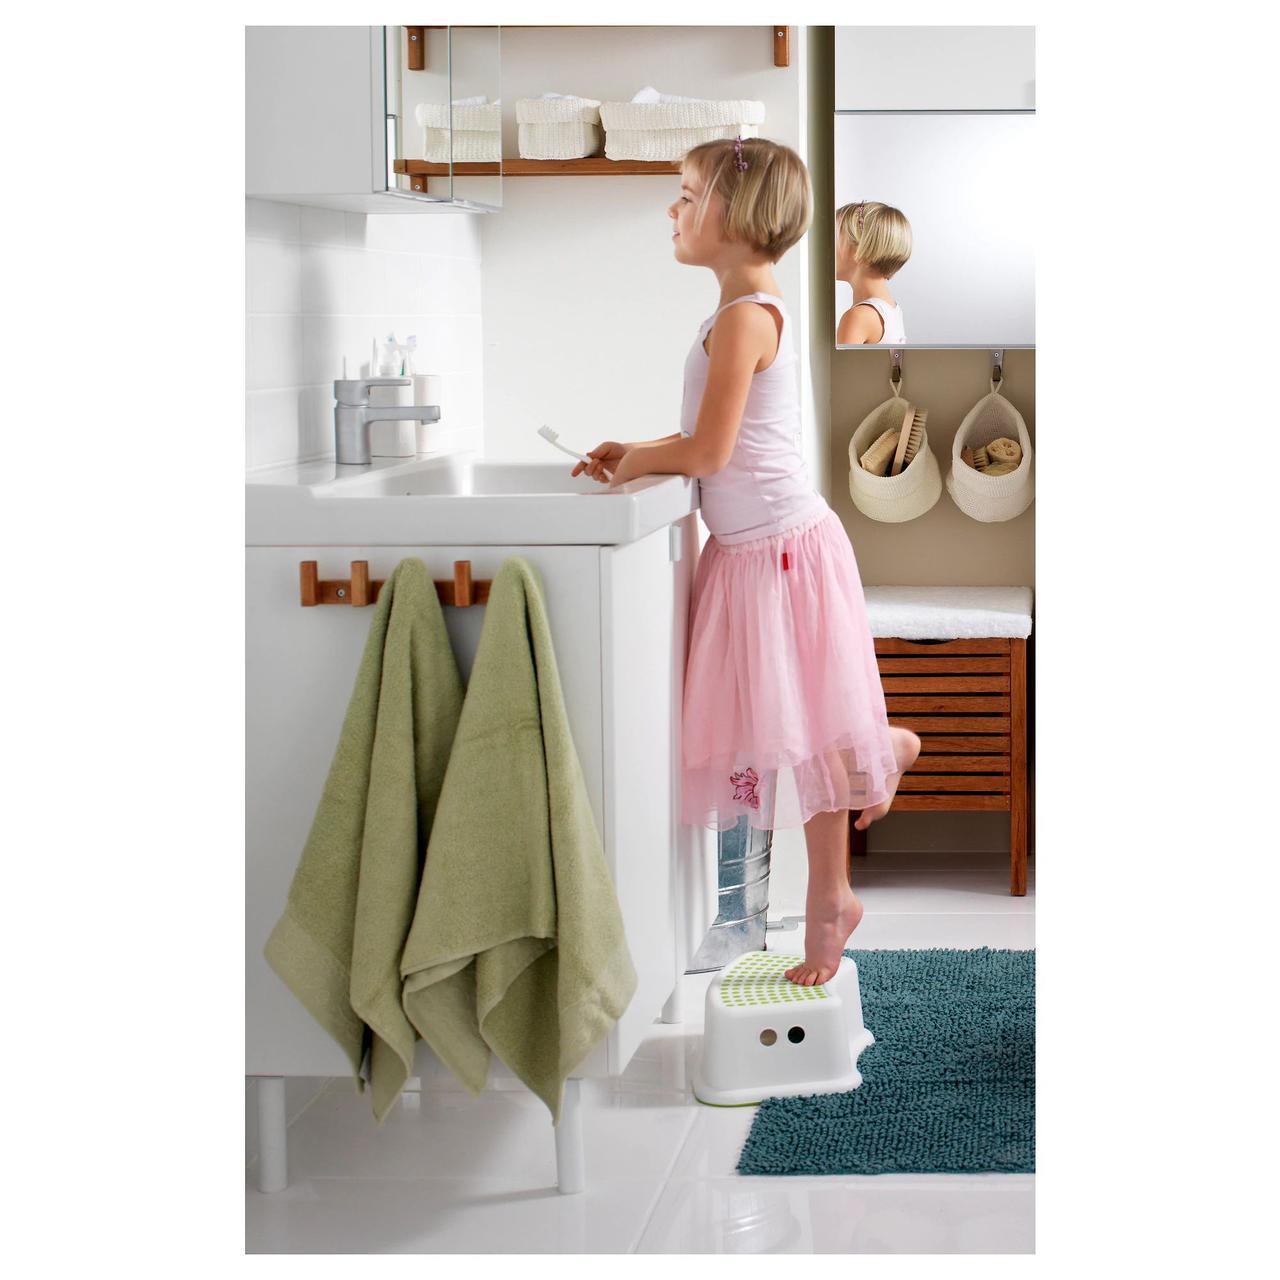 Передплата! Табурет дитячий IKEA FORSIKTIG білий 602.484.18